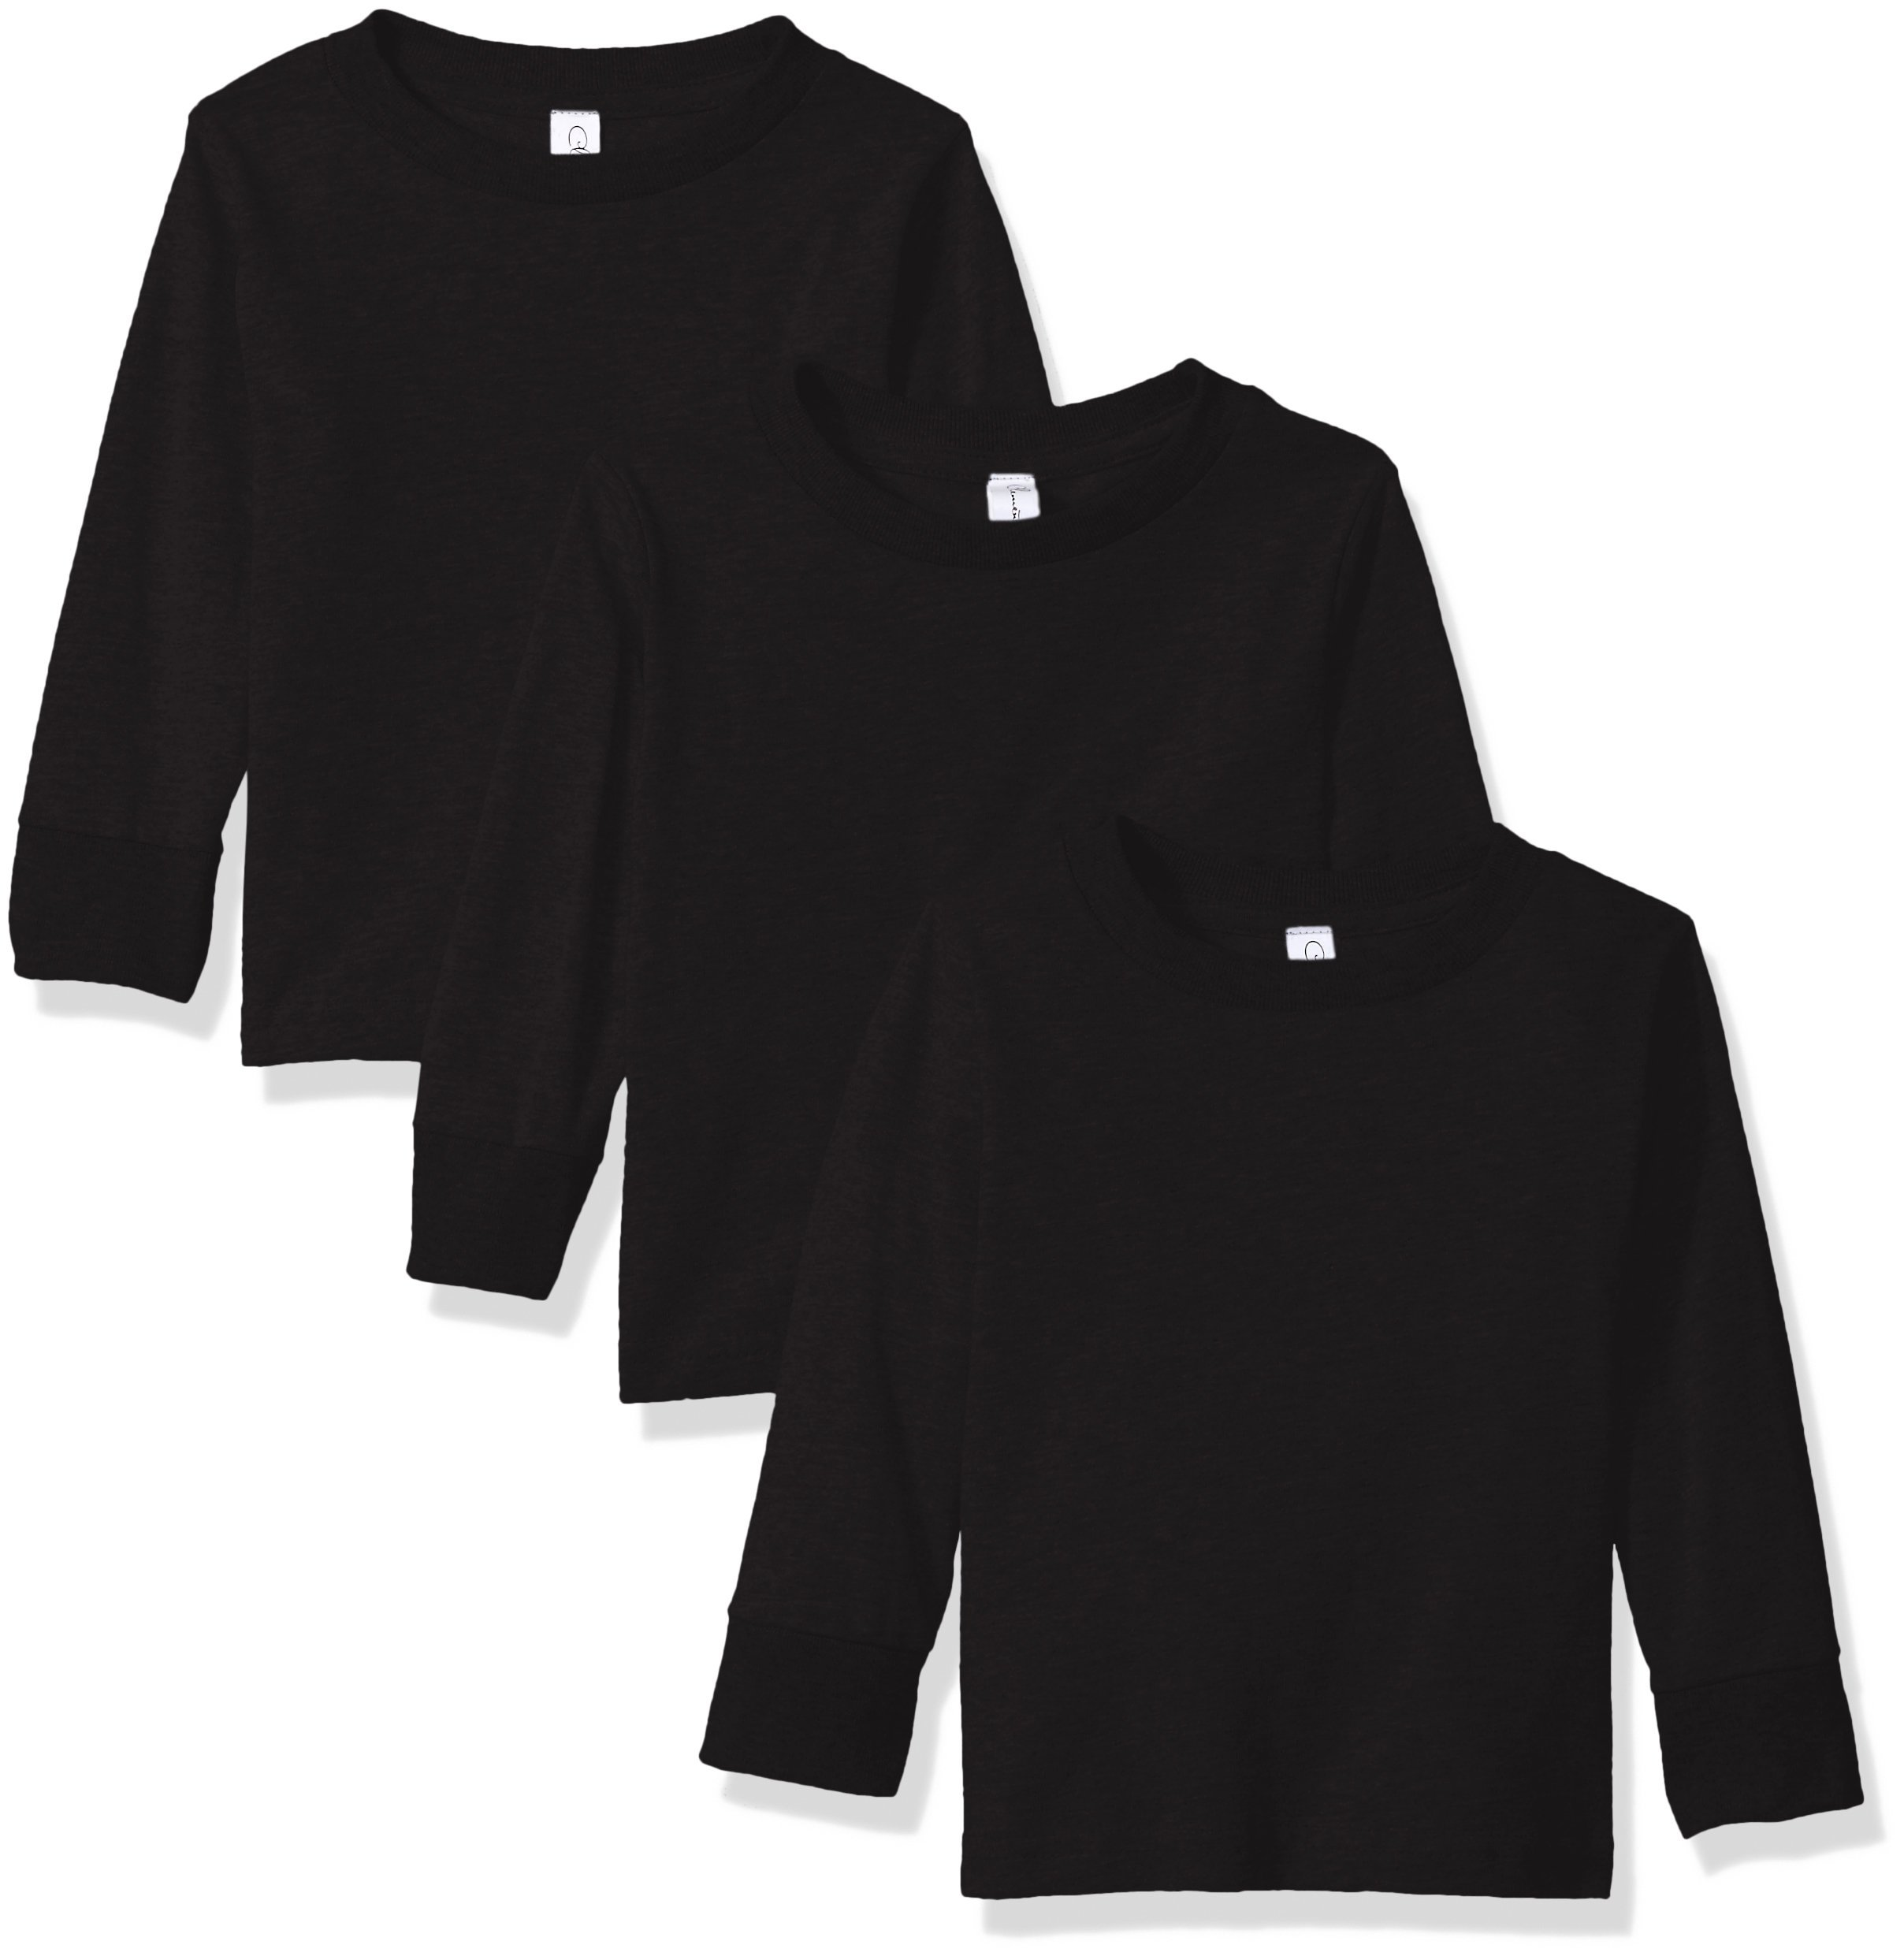 Clementine Apparel Baby Little Girls' Long Sleeve Basic Tee 3pack, Black, 2T